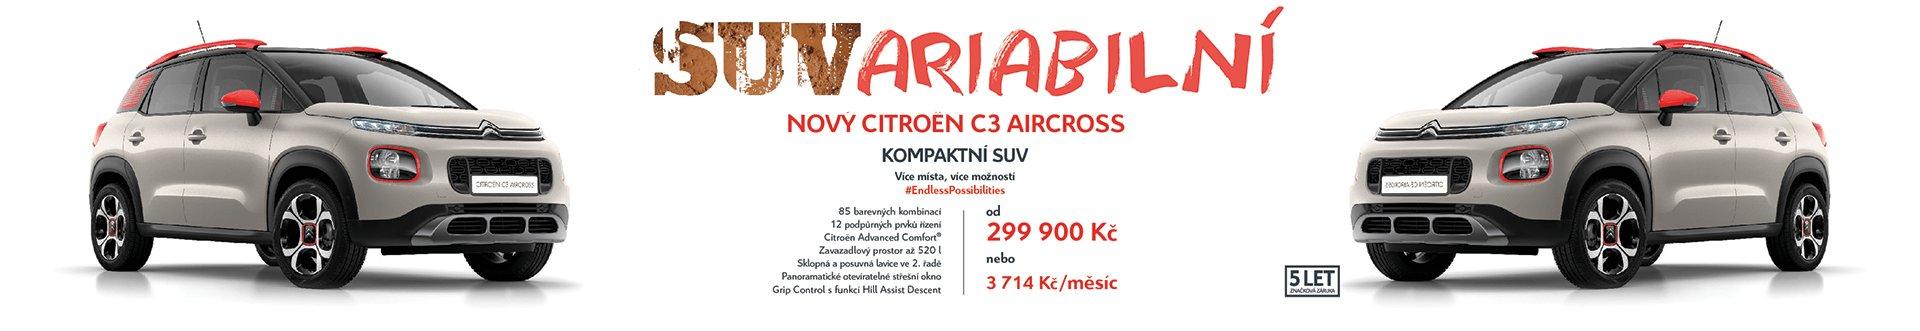 SUV C3 Aircross